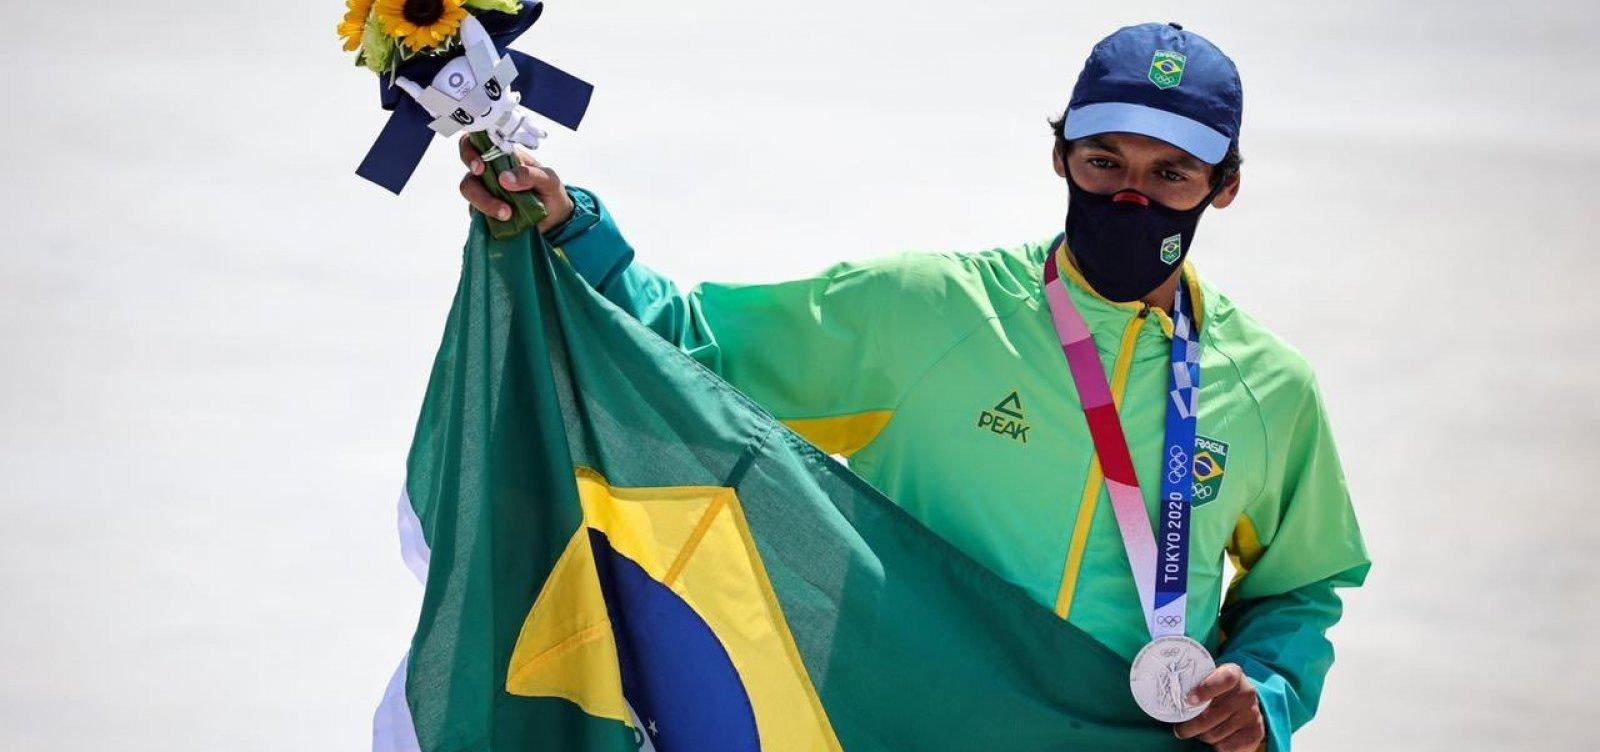 No Skate, Brasil garante primeira medalha nas Olimpíadas 2020